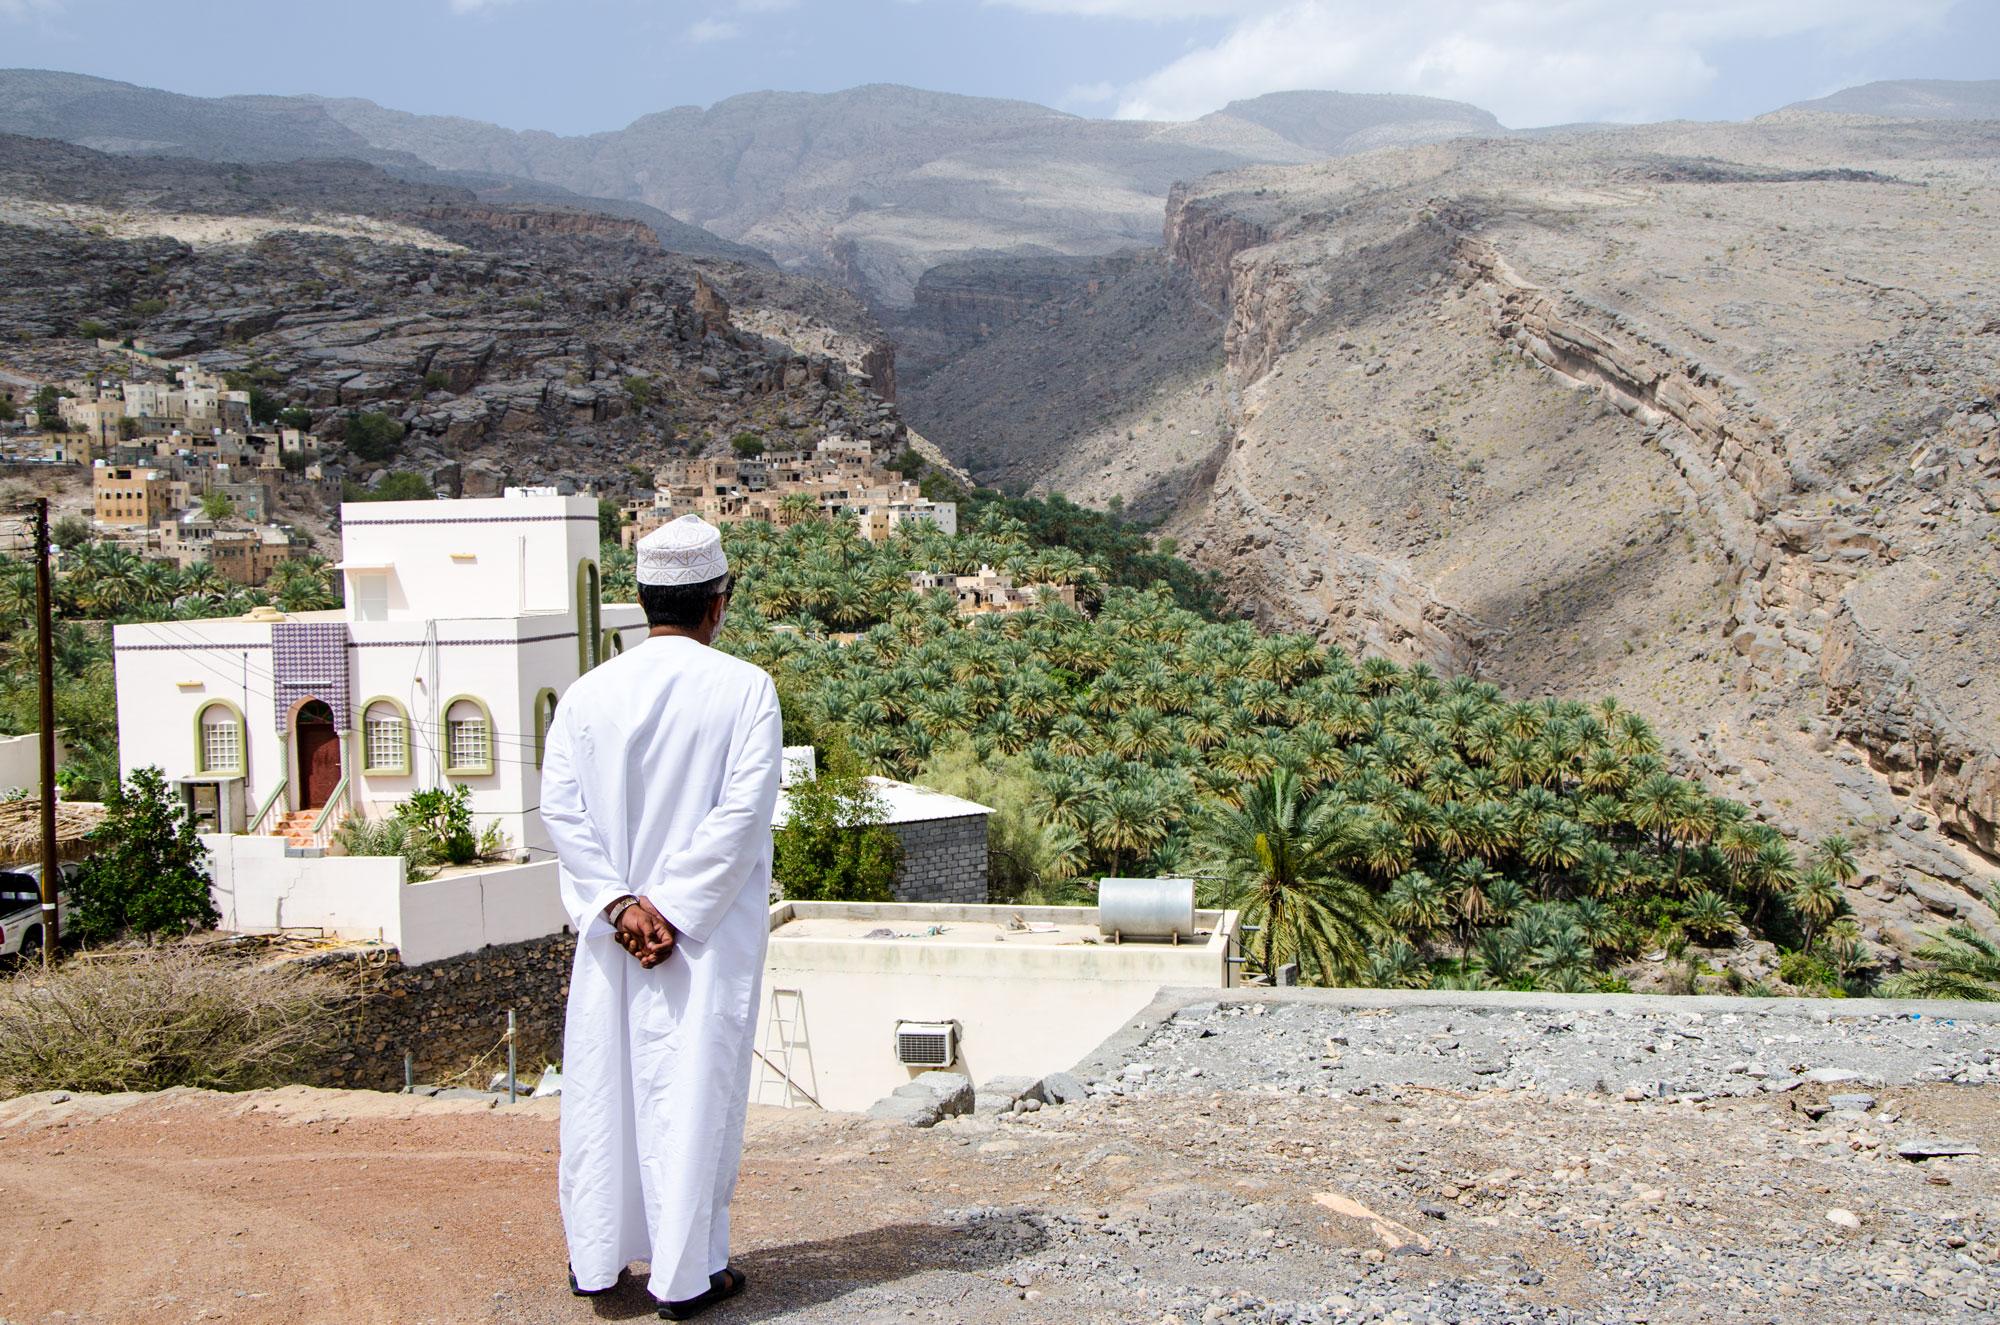 Nun geht's in die Berge: das grüne Dorf Al Misfah. Foto: Lothar Ruttner